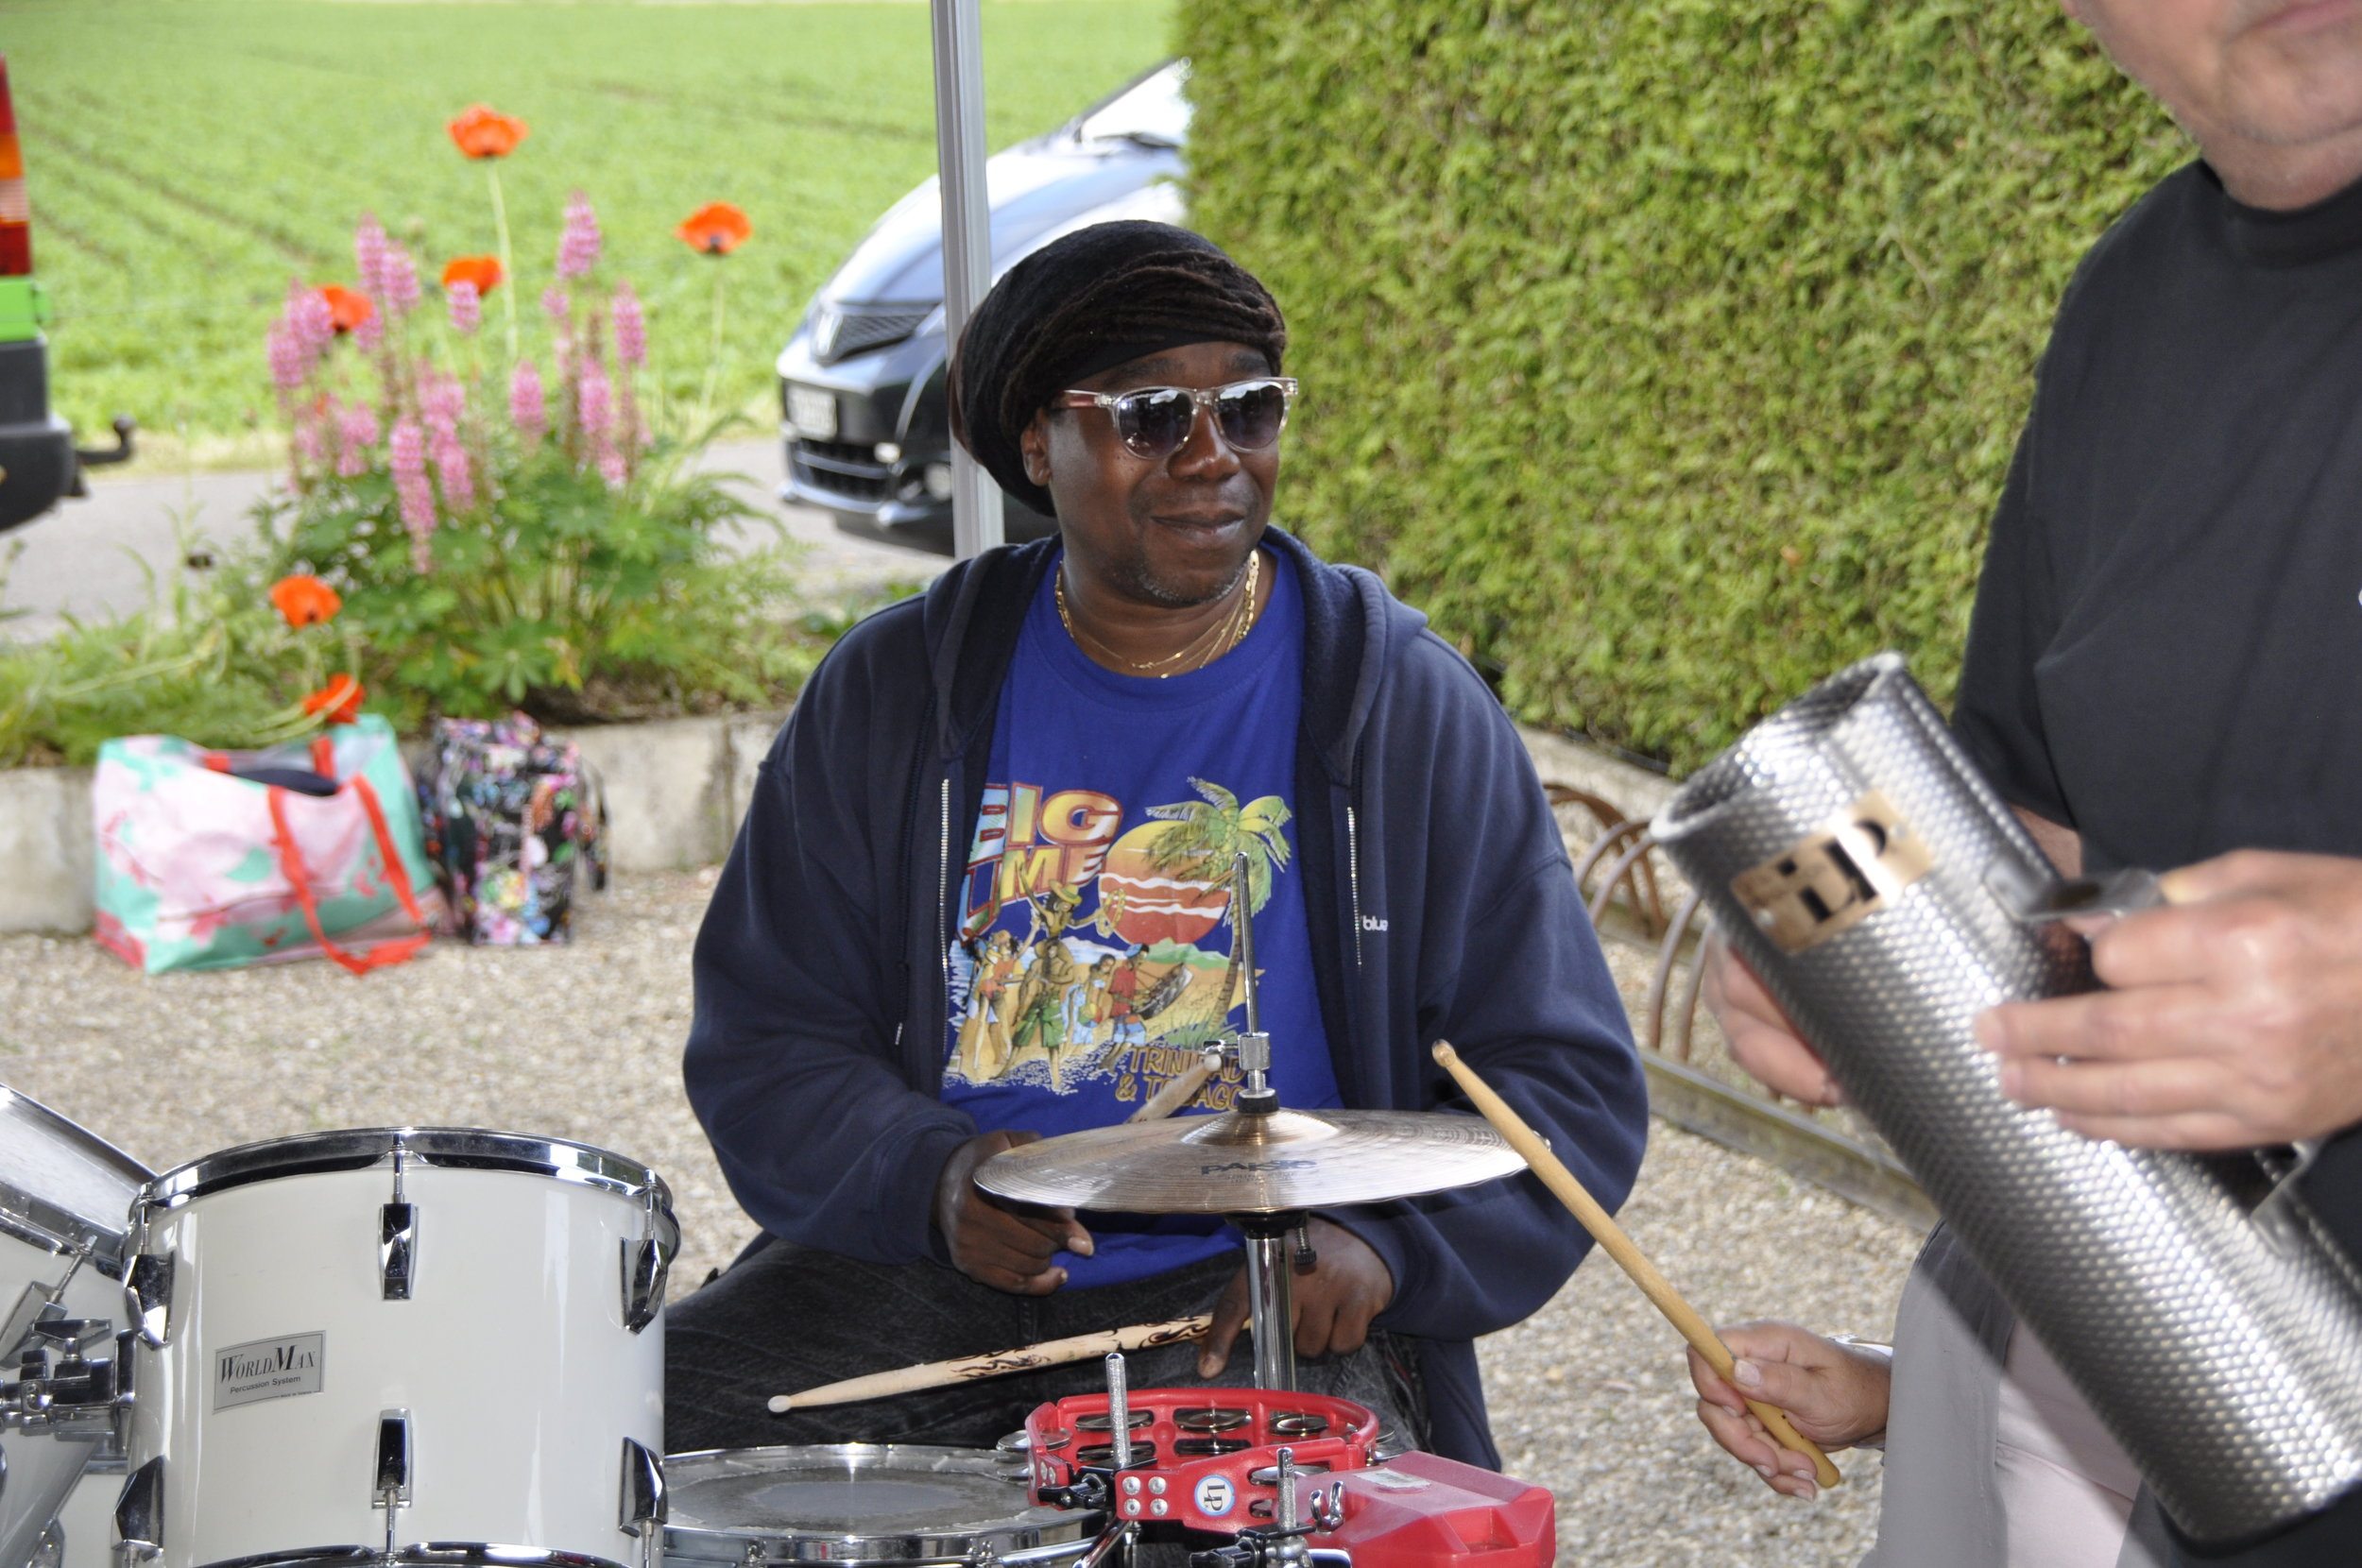 Junior performing at his birthday in Switzerland